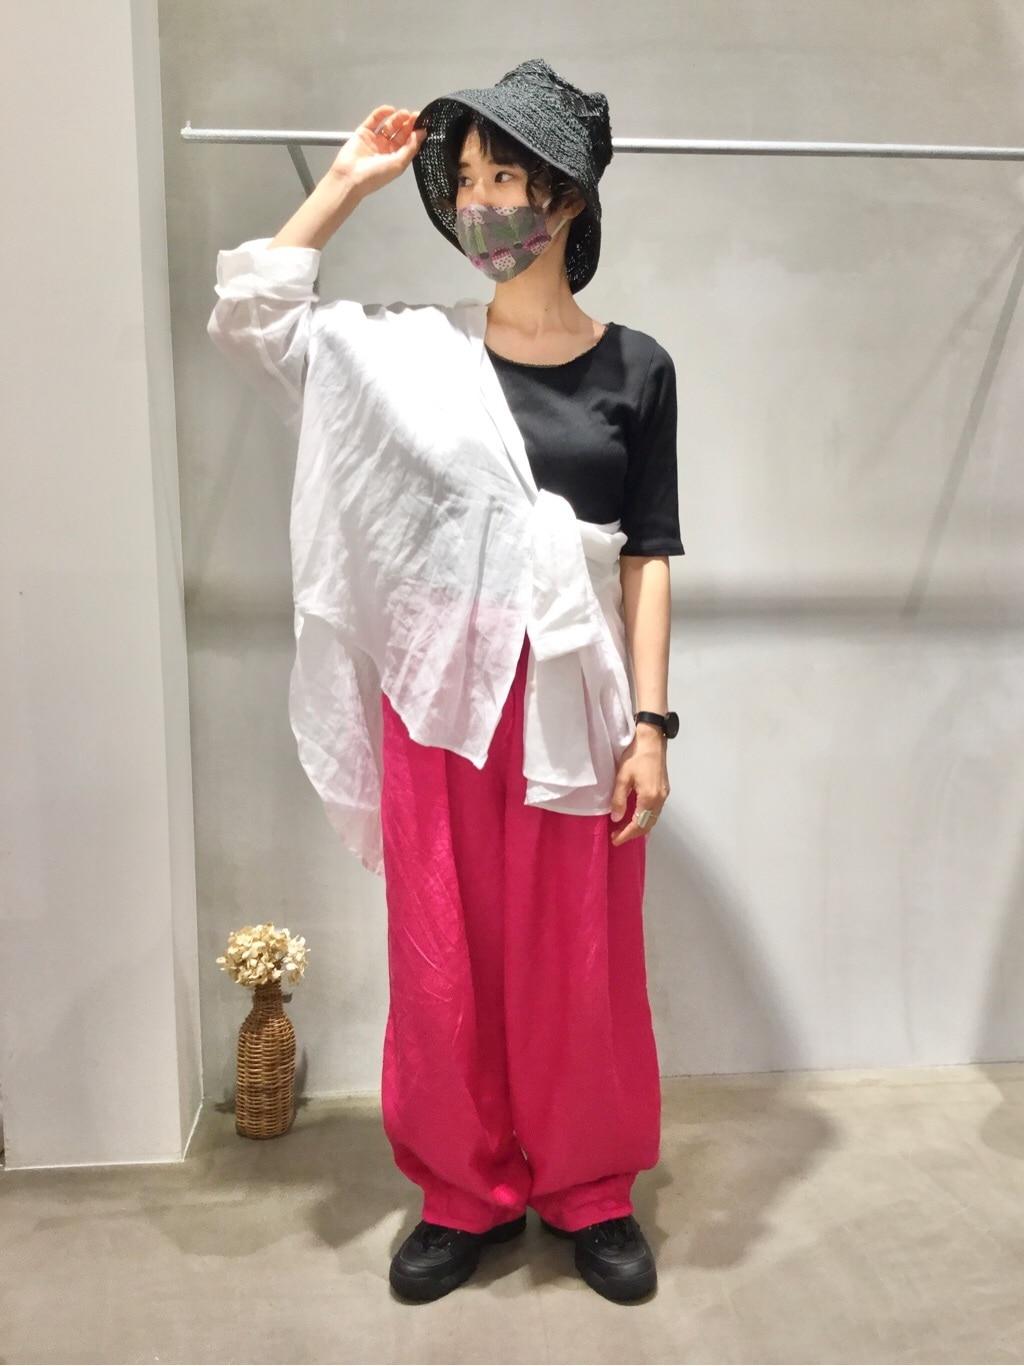 yuni / bulle de savon 京都路面 身長:159cm 2020.07.29